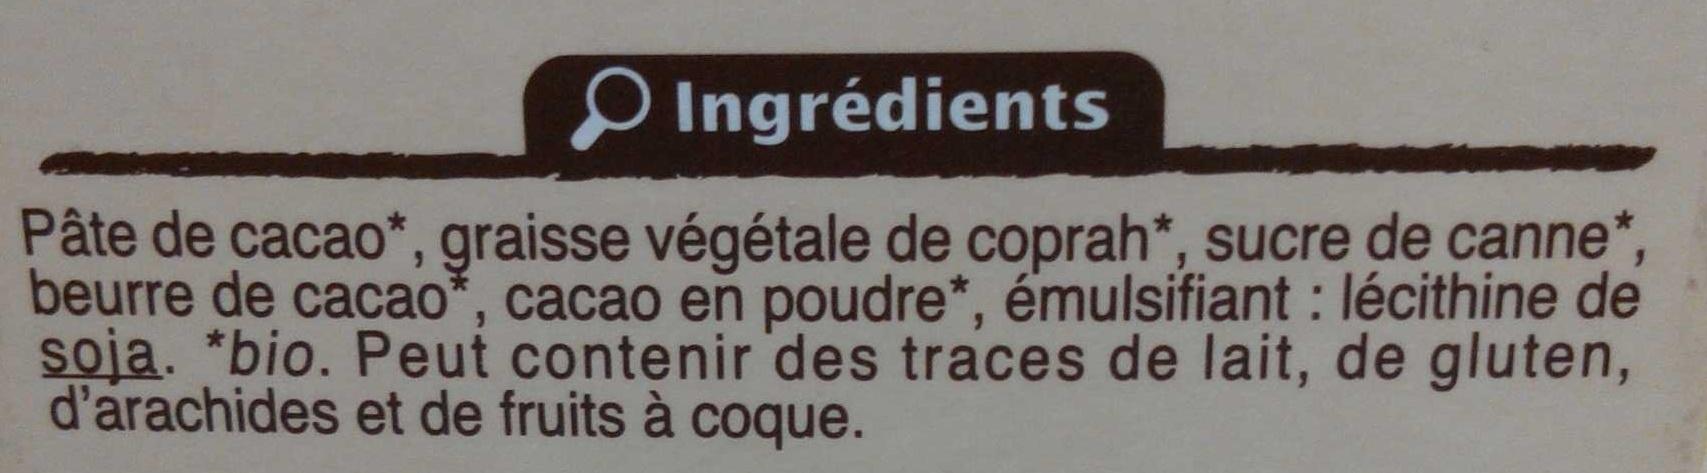 Truffes fantaisie fondates - Ingrediënten